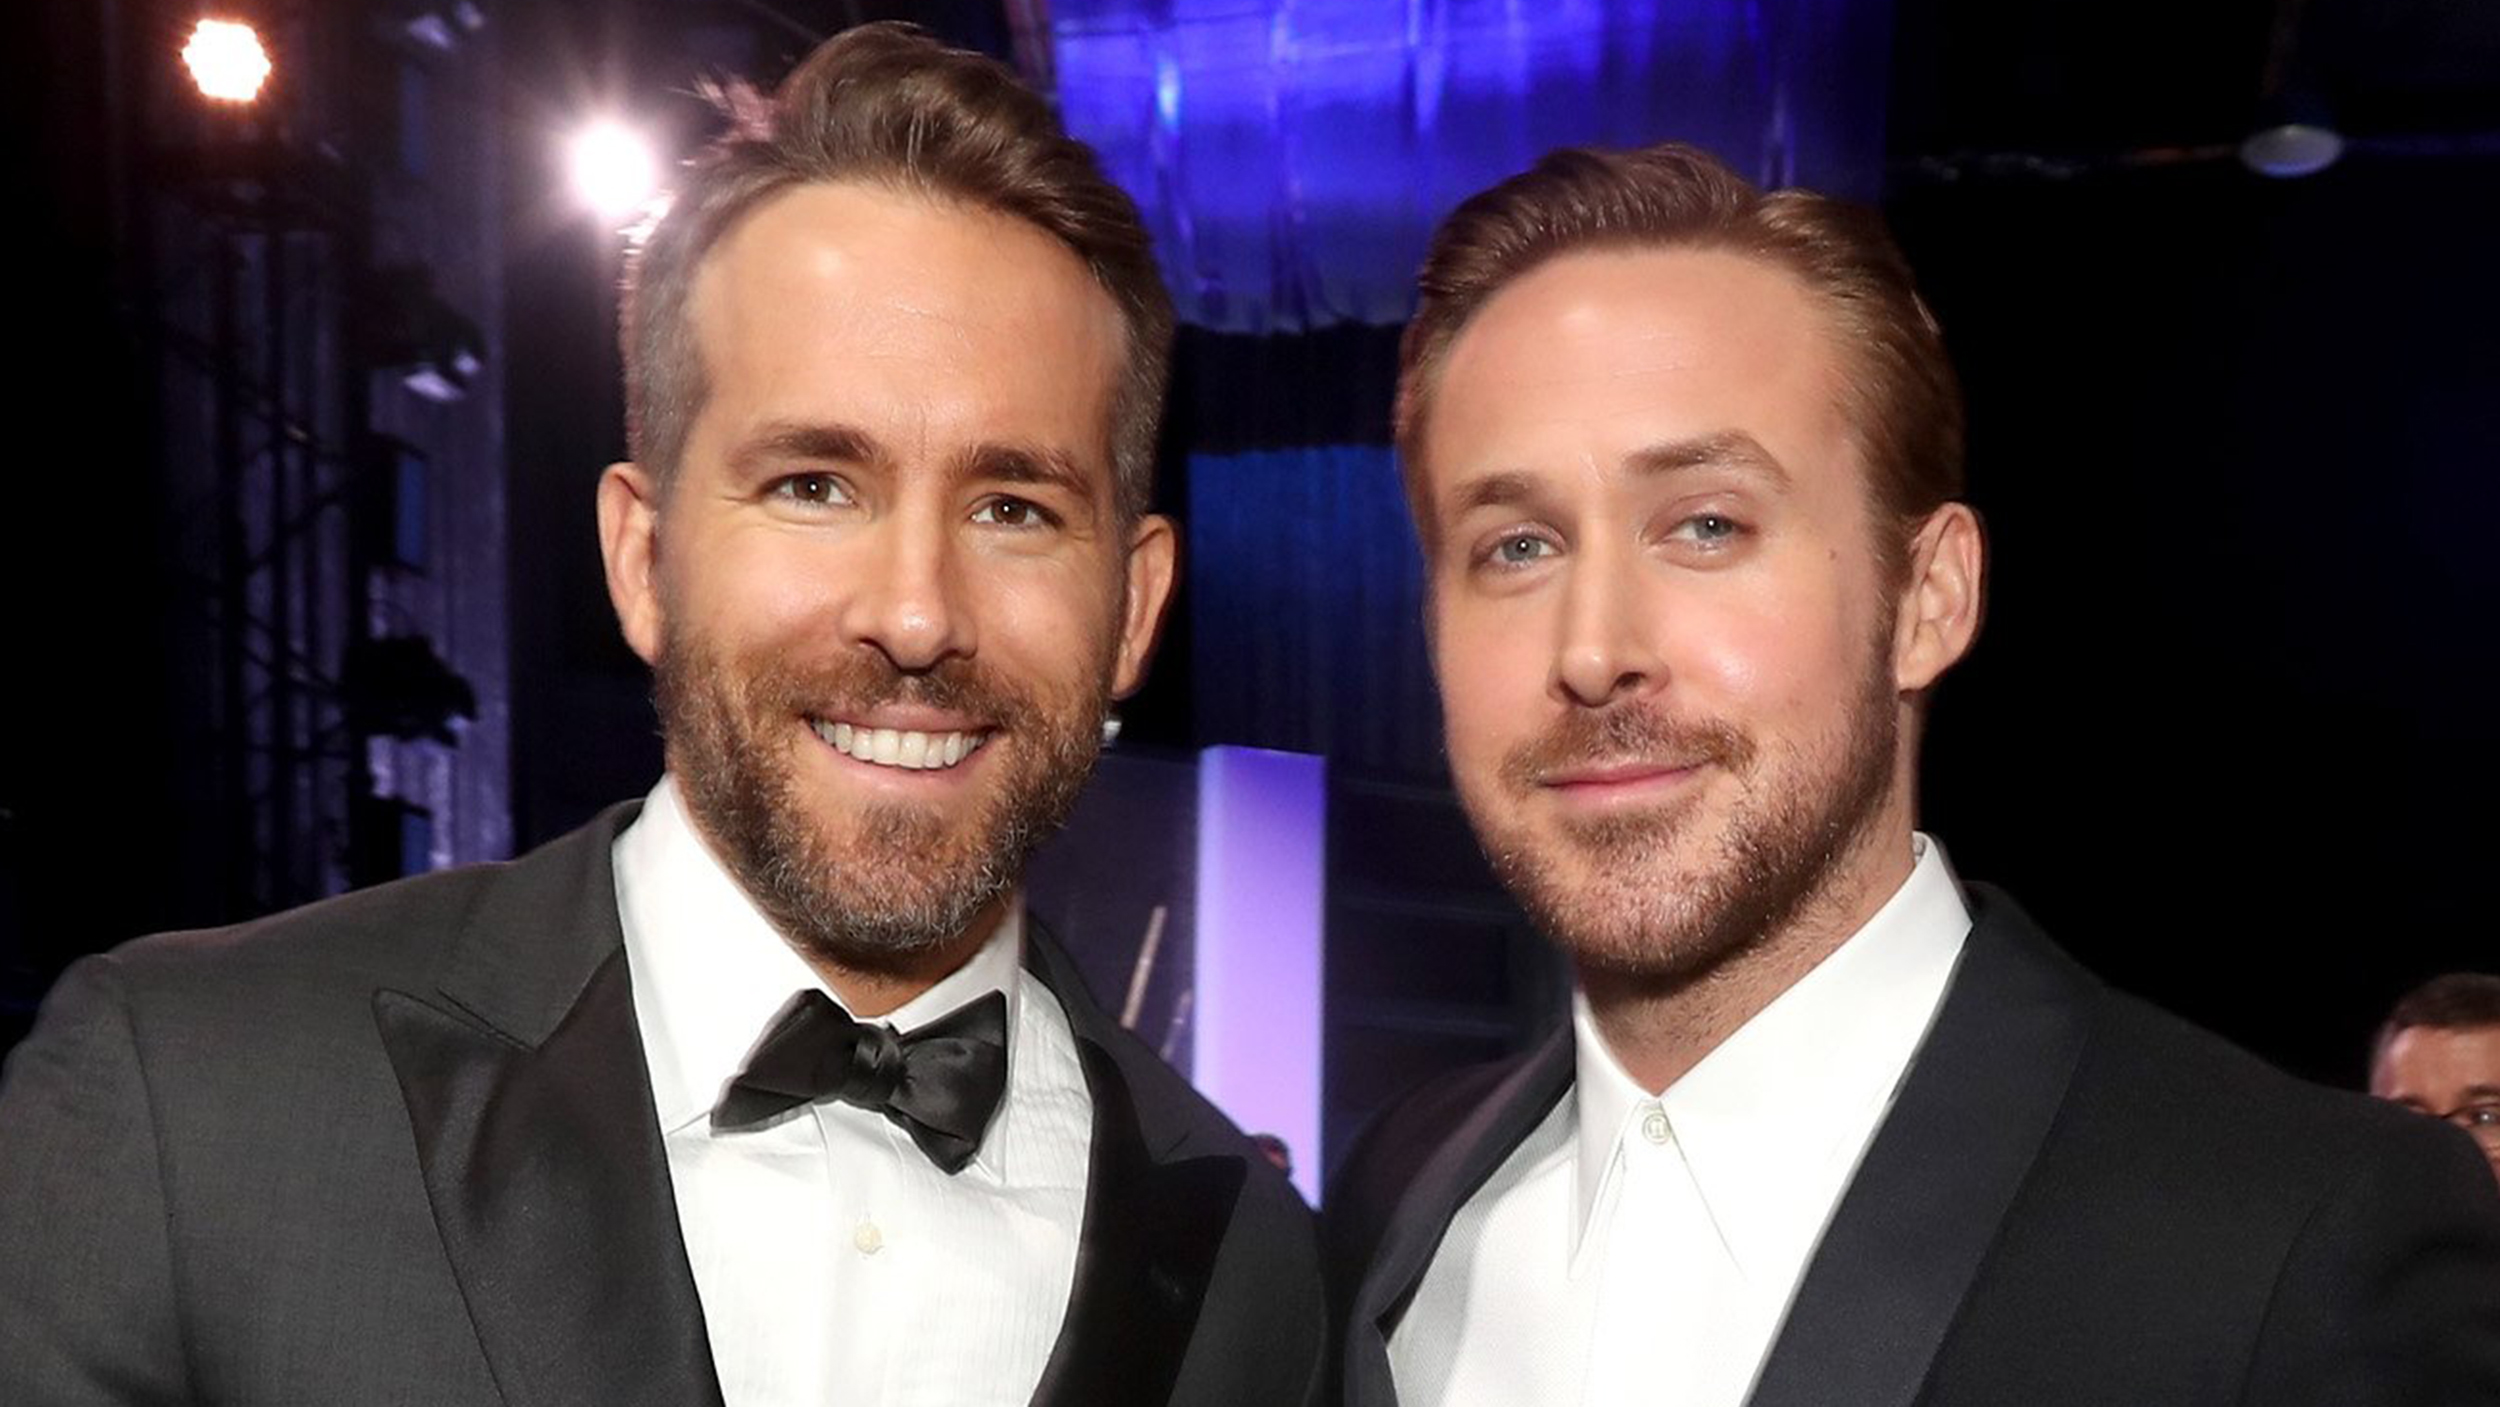 Ryan Reynolds, Ryan Gosling meet at Critics' Choice Awards ...